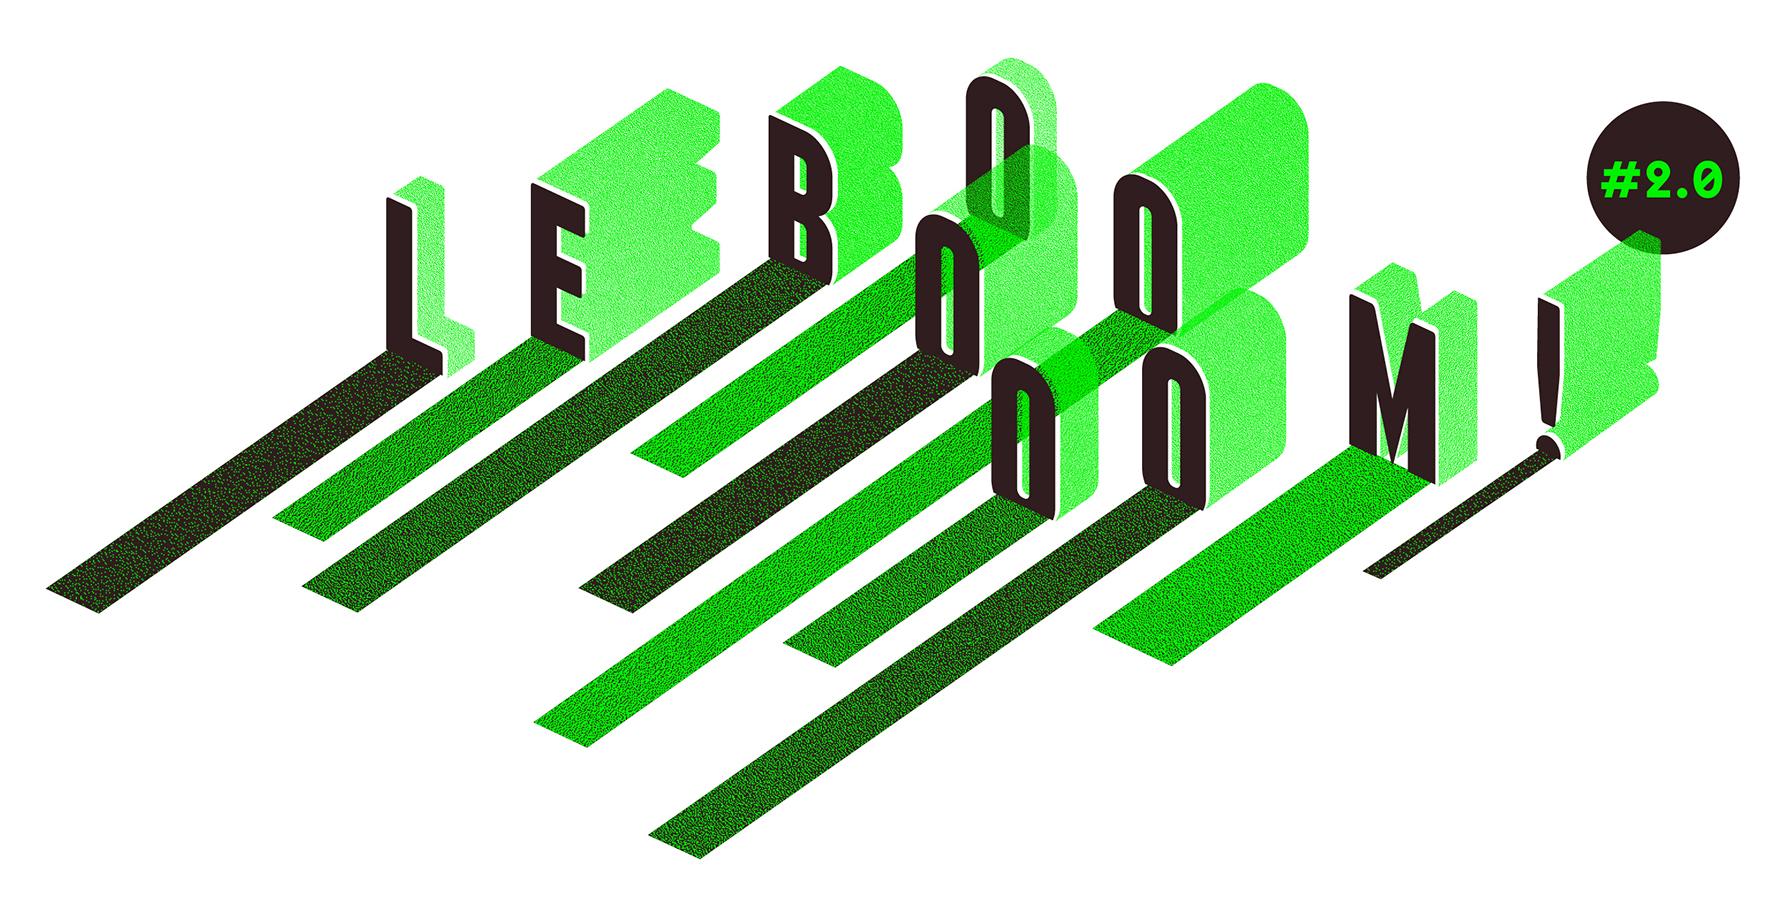 logotype2.0